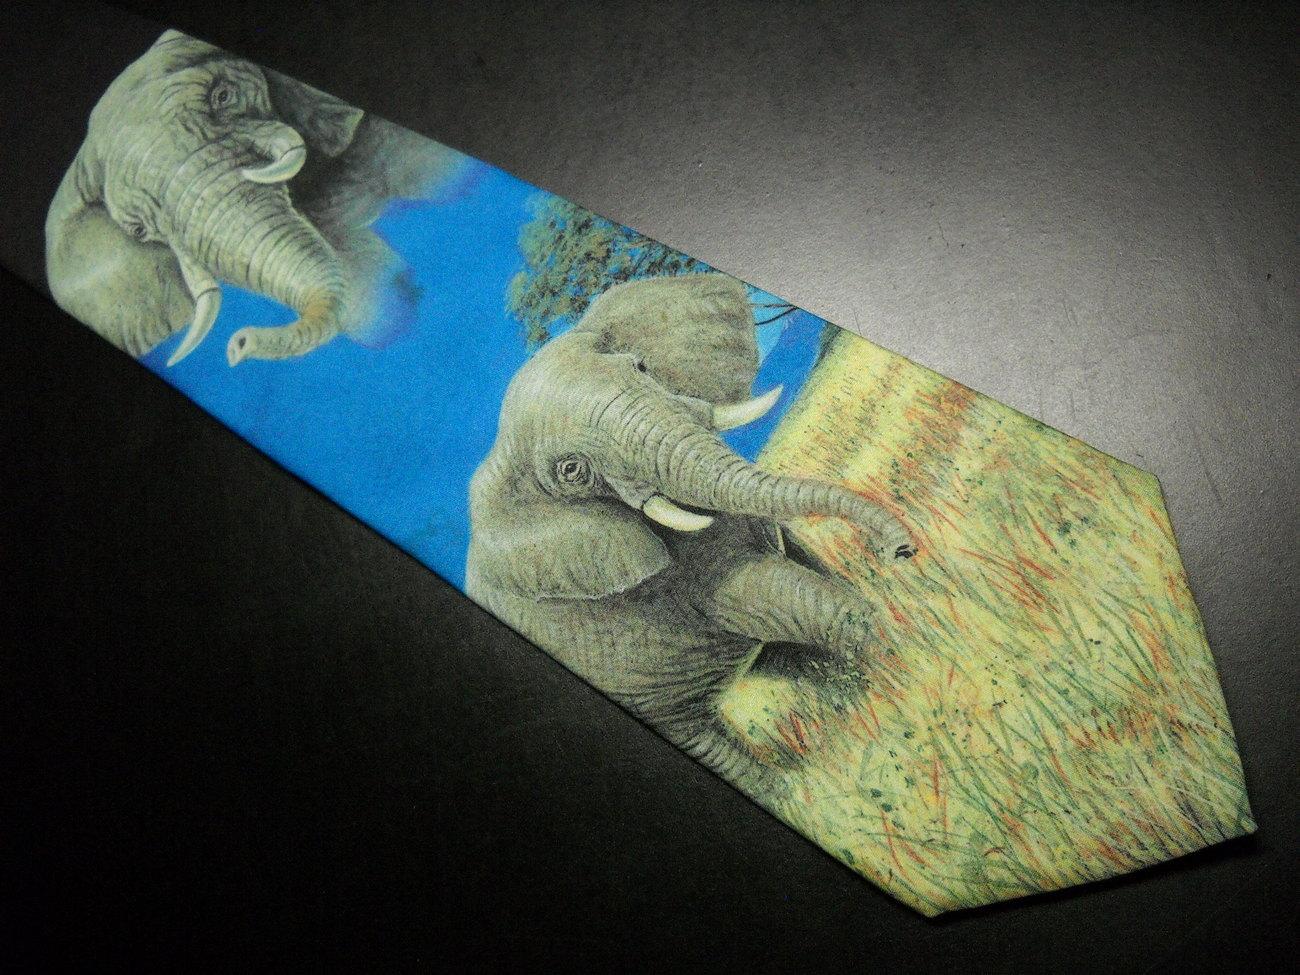 Ralph Marlin Neck Tie Elephants 1999 John F McGee Polyester